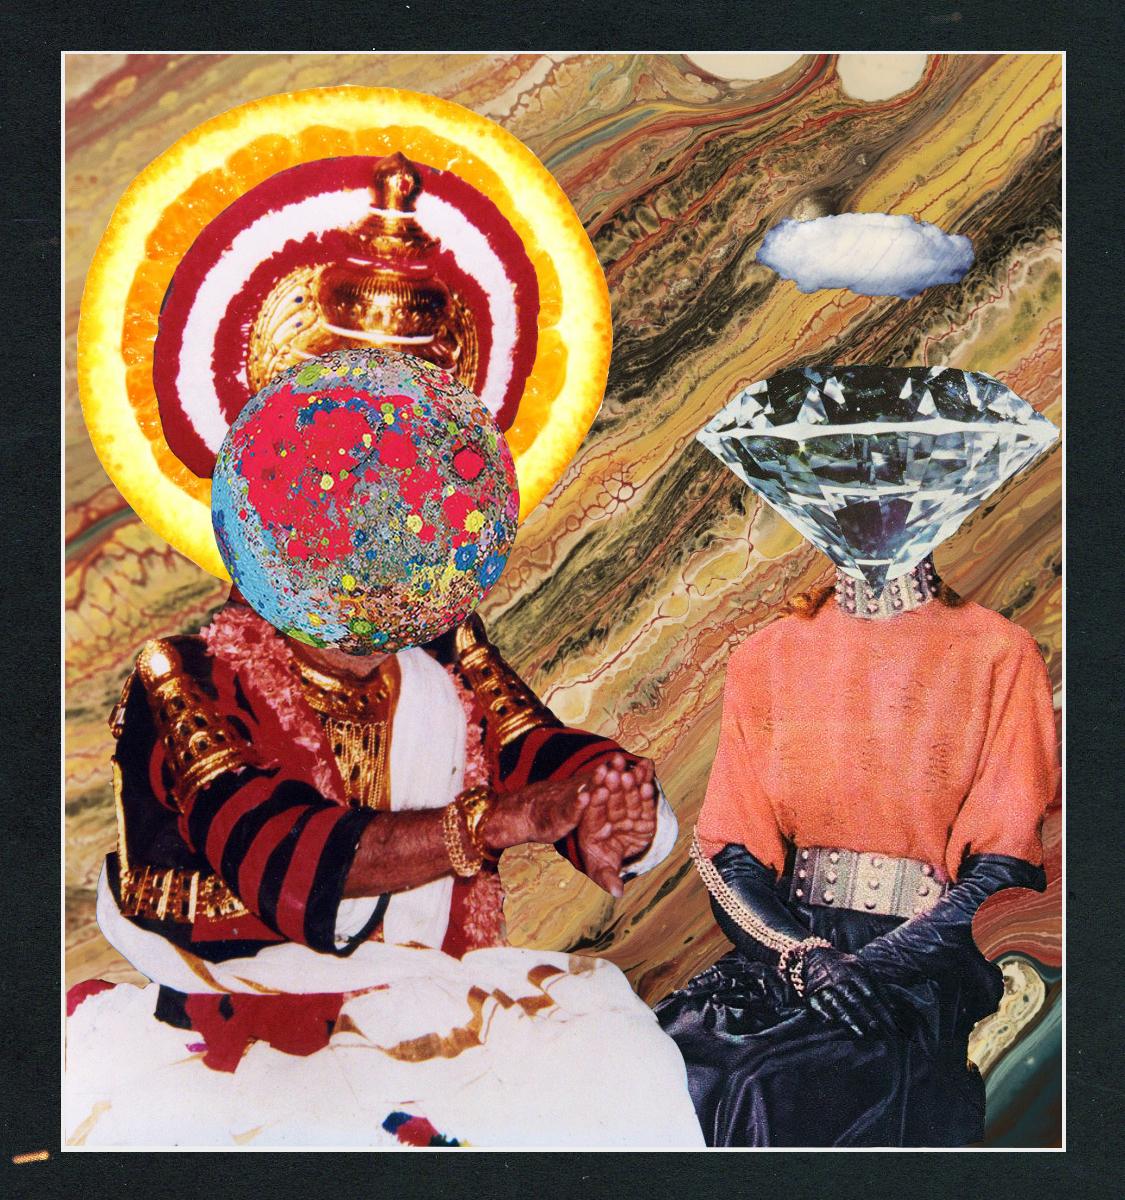 The Creators' Tarot [collage, 2015]